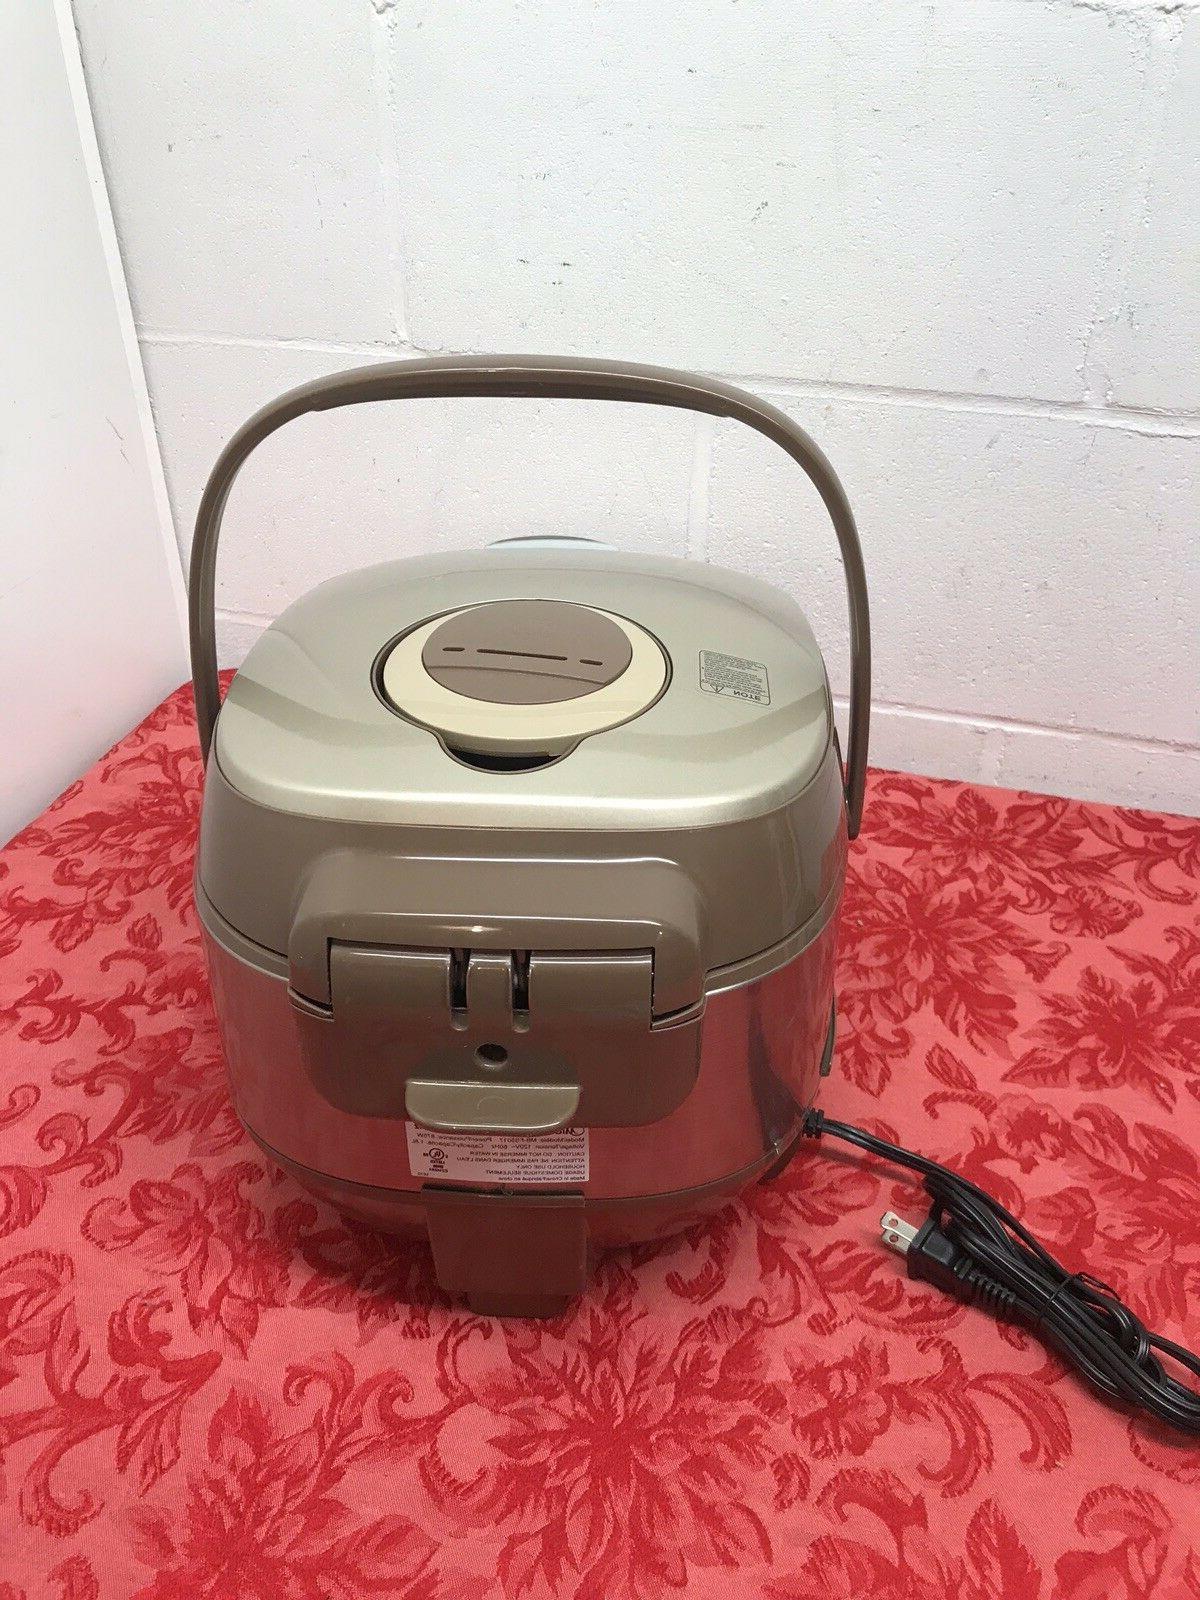 Midea Mb-fs5017 10 C. Smart Cooker Steamer Slow New Other